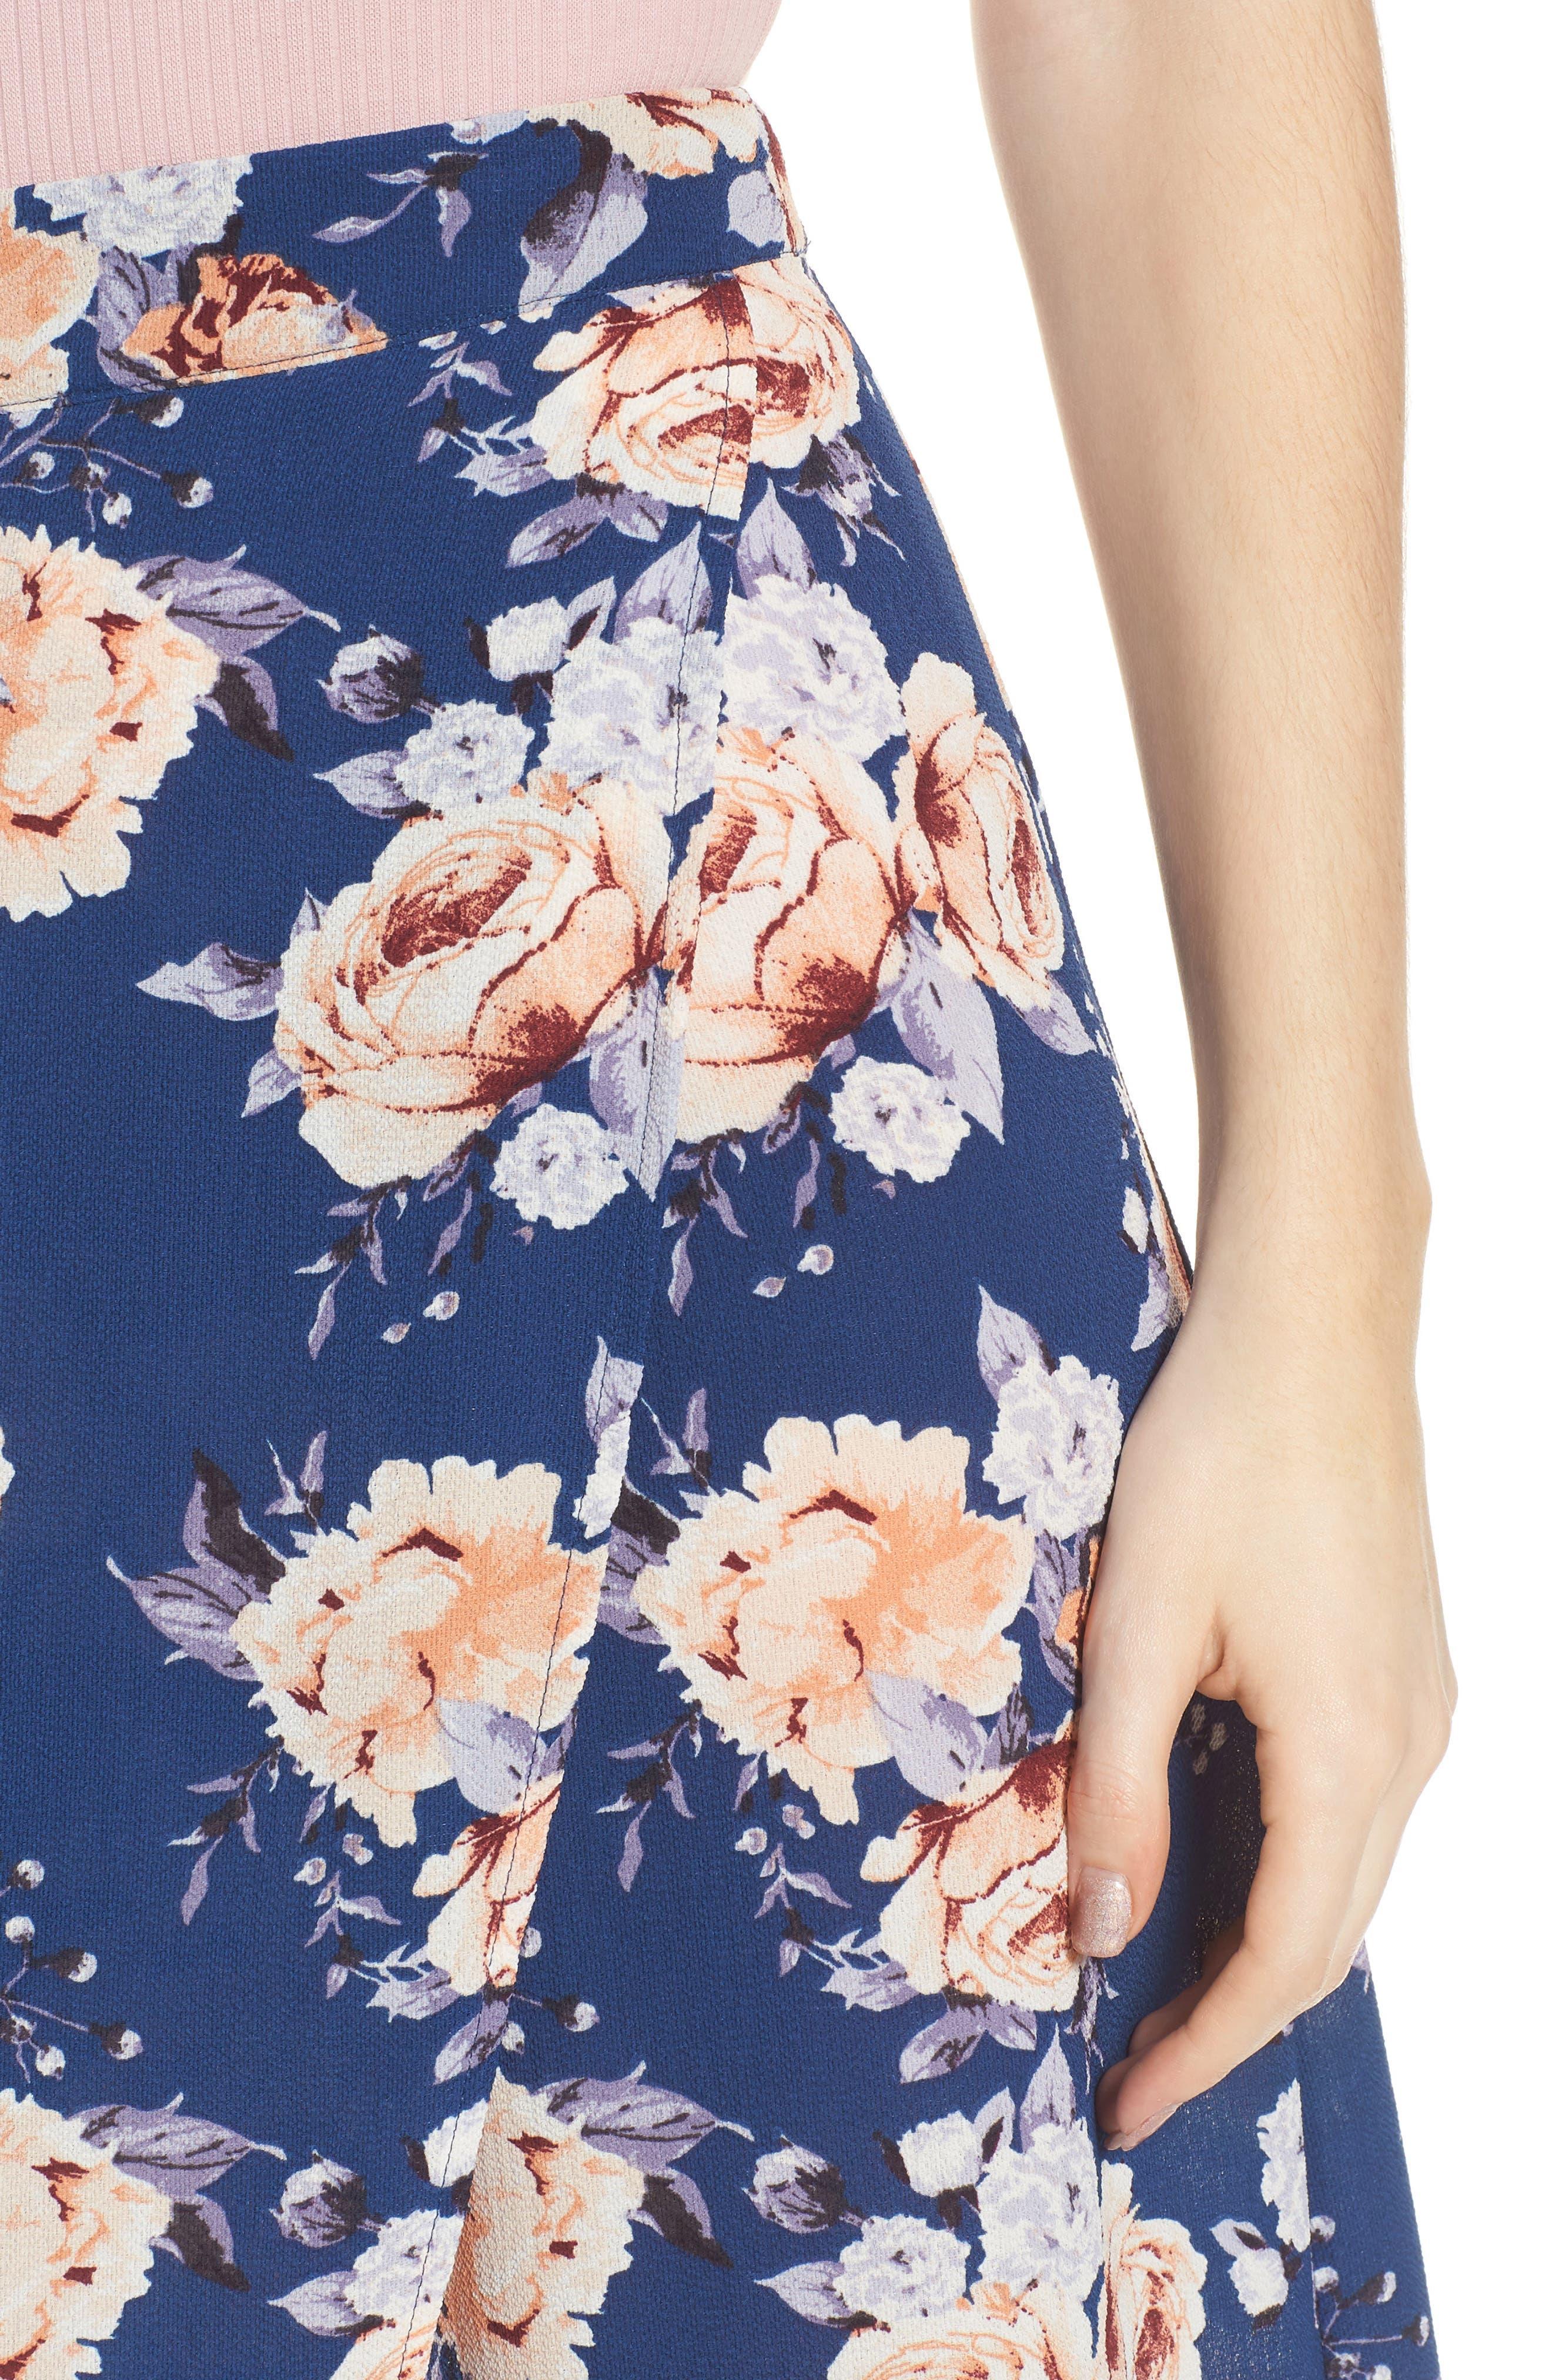 Floral Print Maxi Skirt,                             Alternate thumbnail 4, color,                             Blue Floral